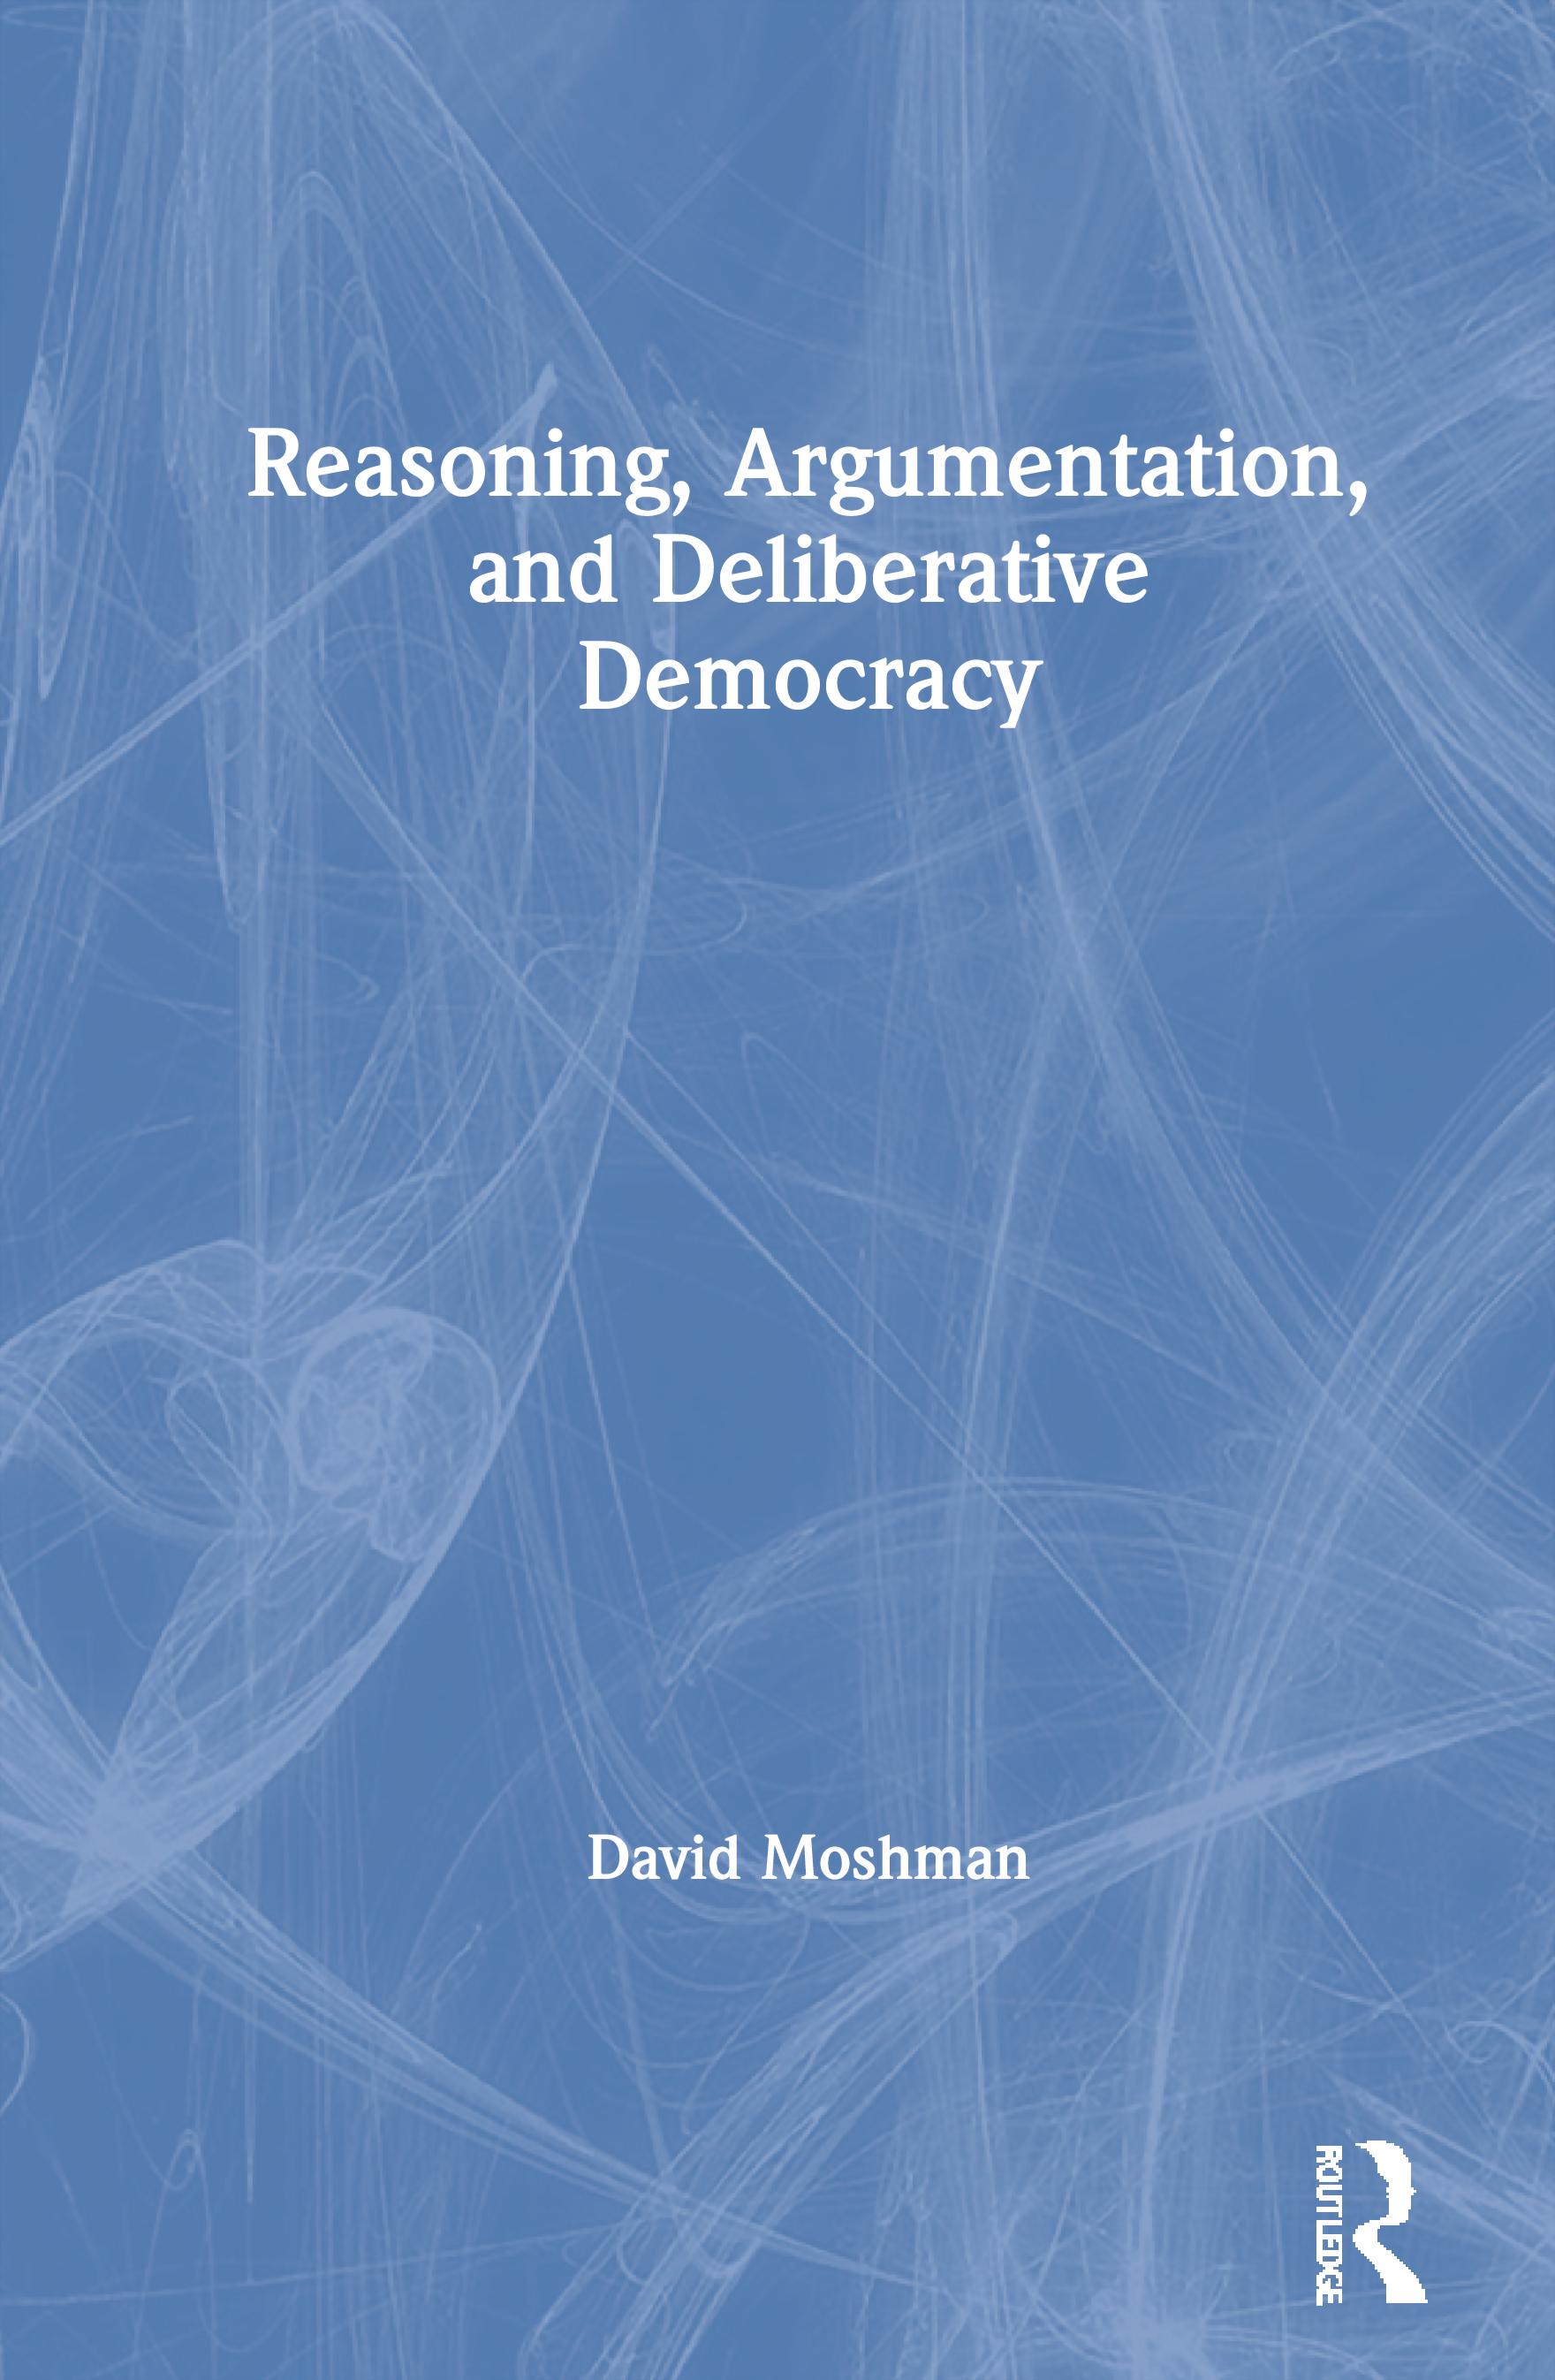 Reasoning, Argumentation, and Deliberative Democracy